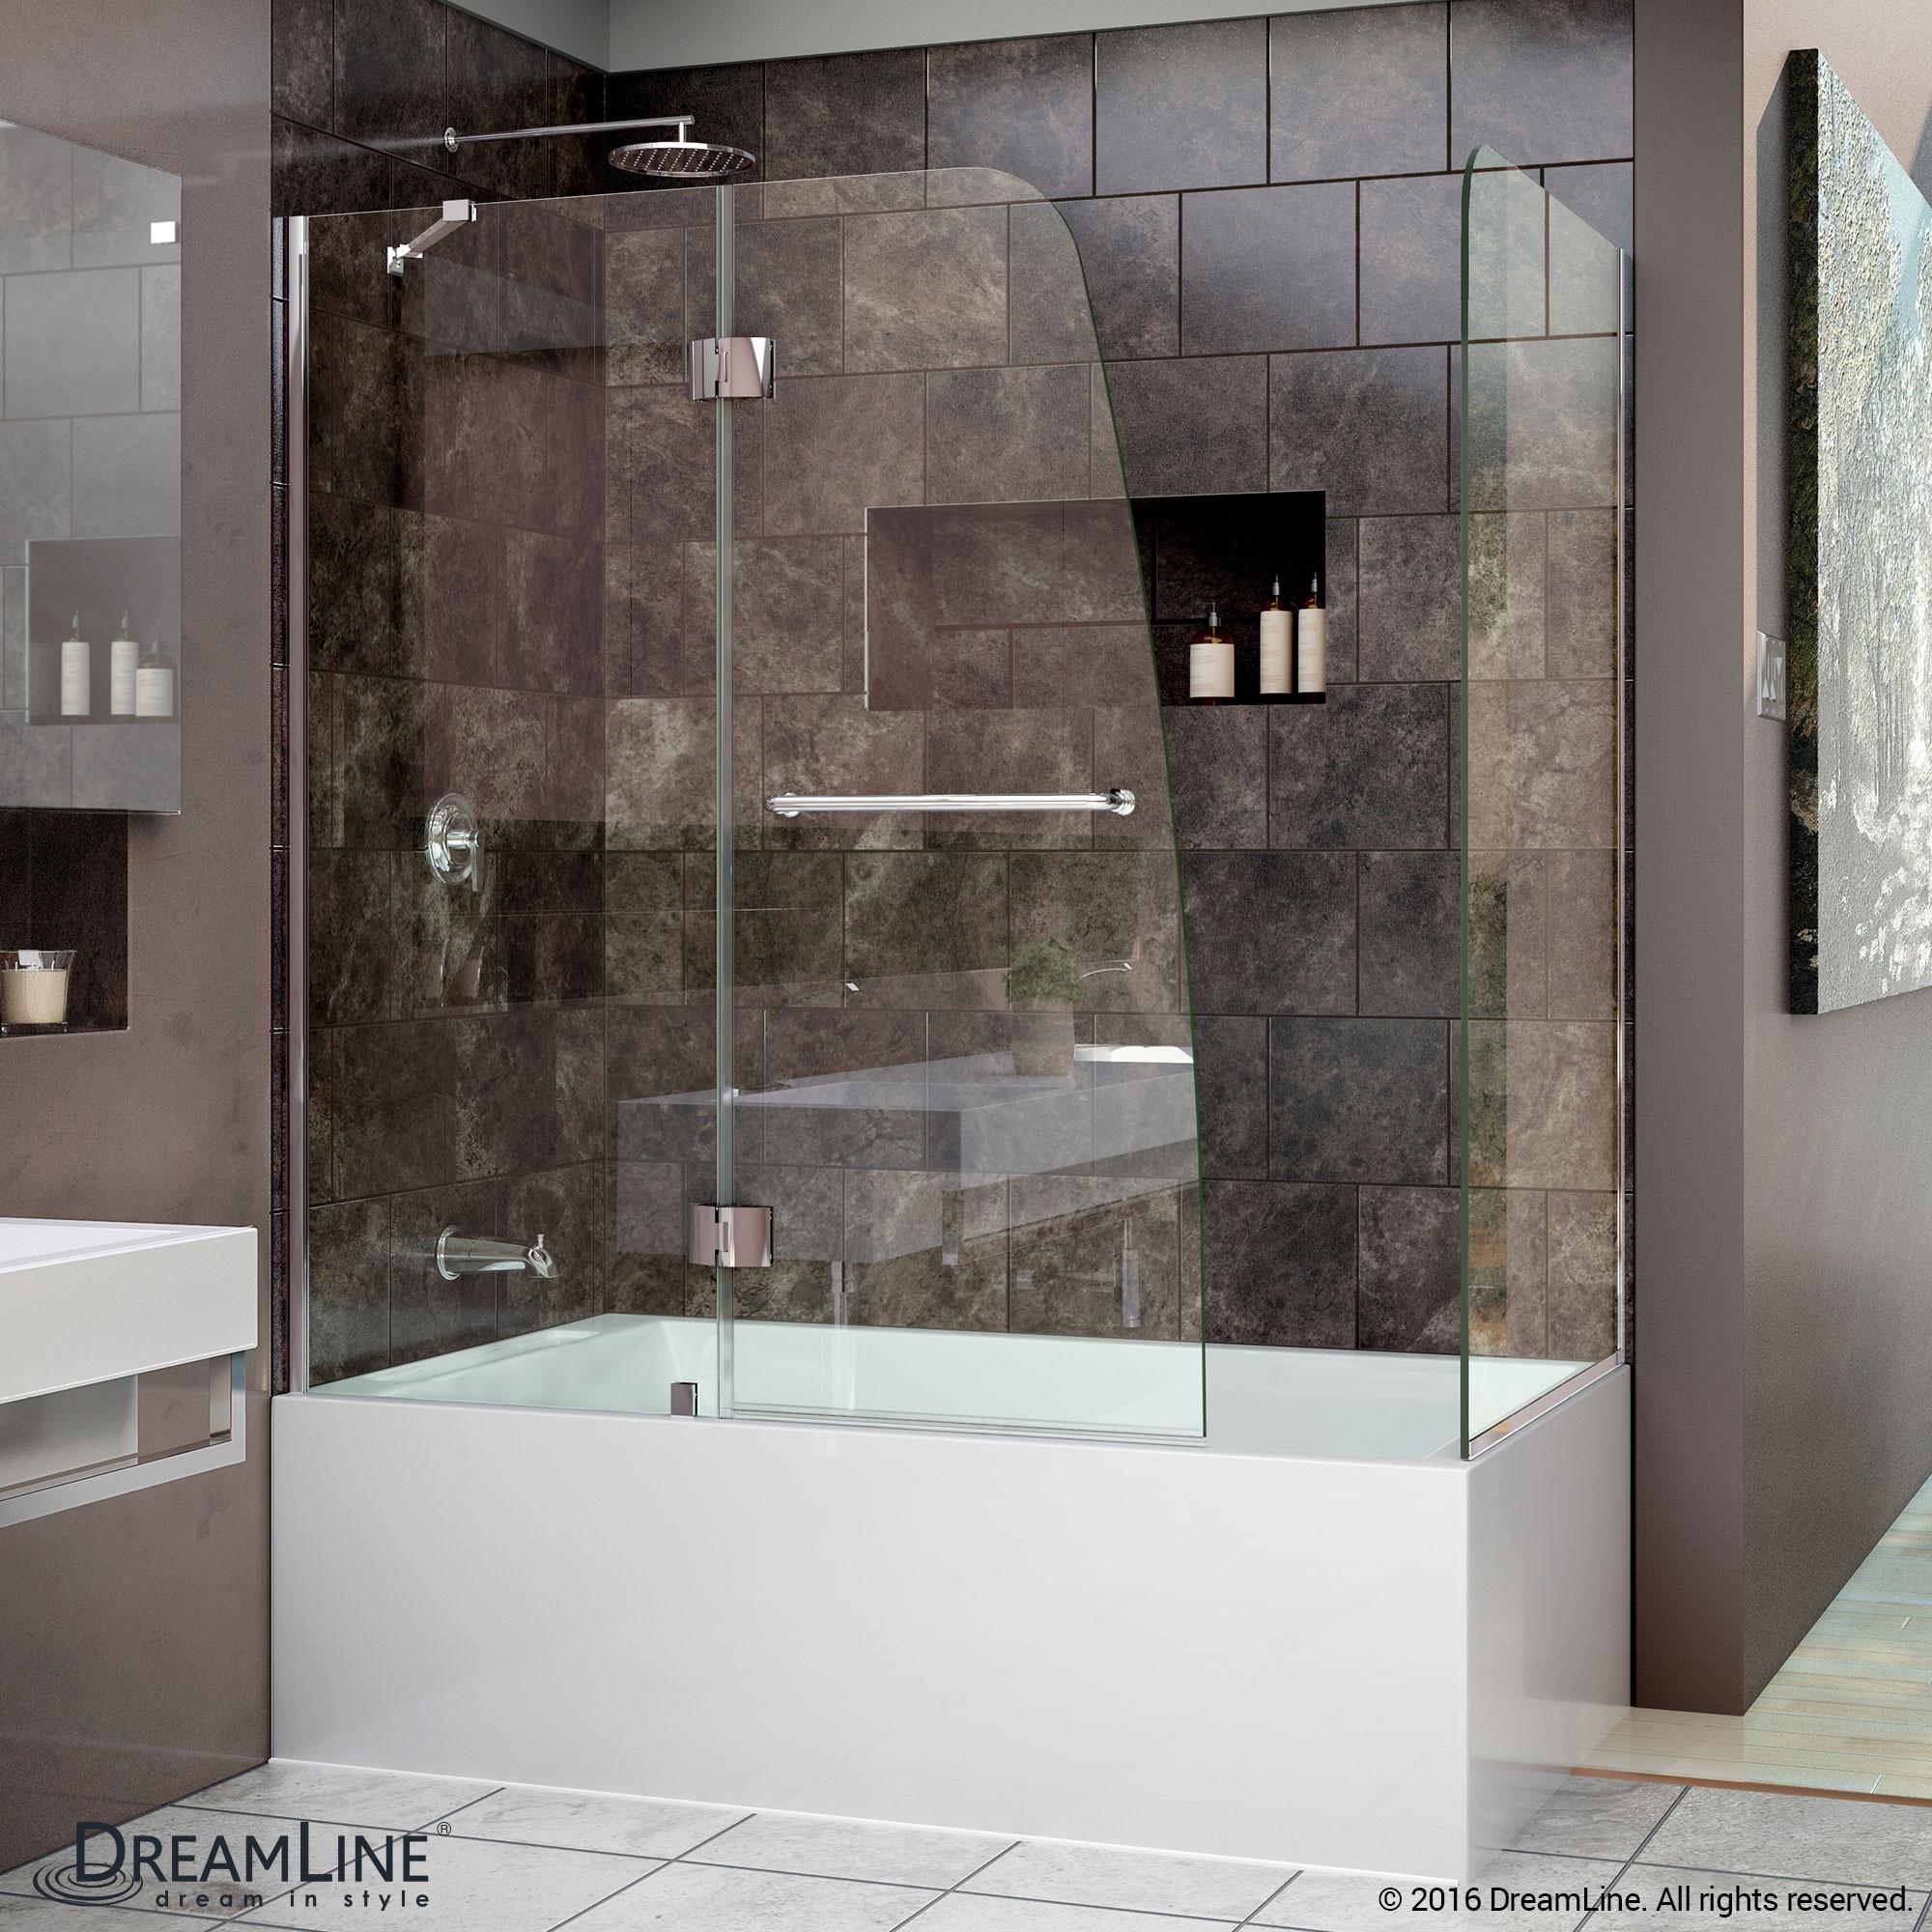 DreamLine SHDR-3148586-RT-01 Chrome Aqua 56 to 60 x 58 Inch Hinged Tub Door